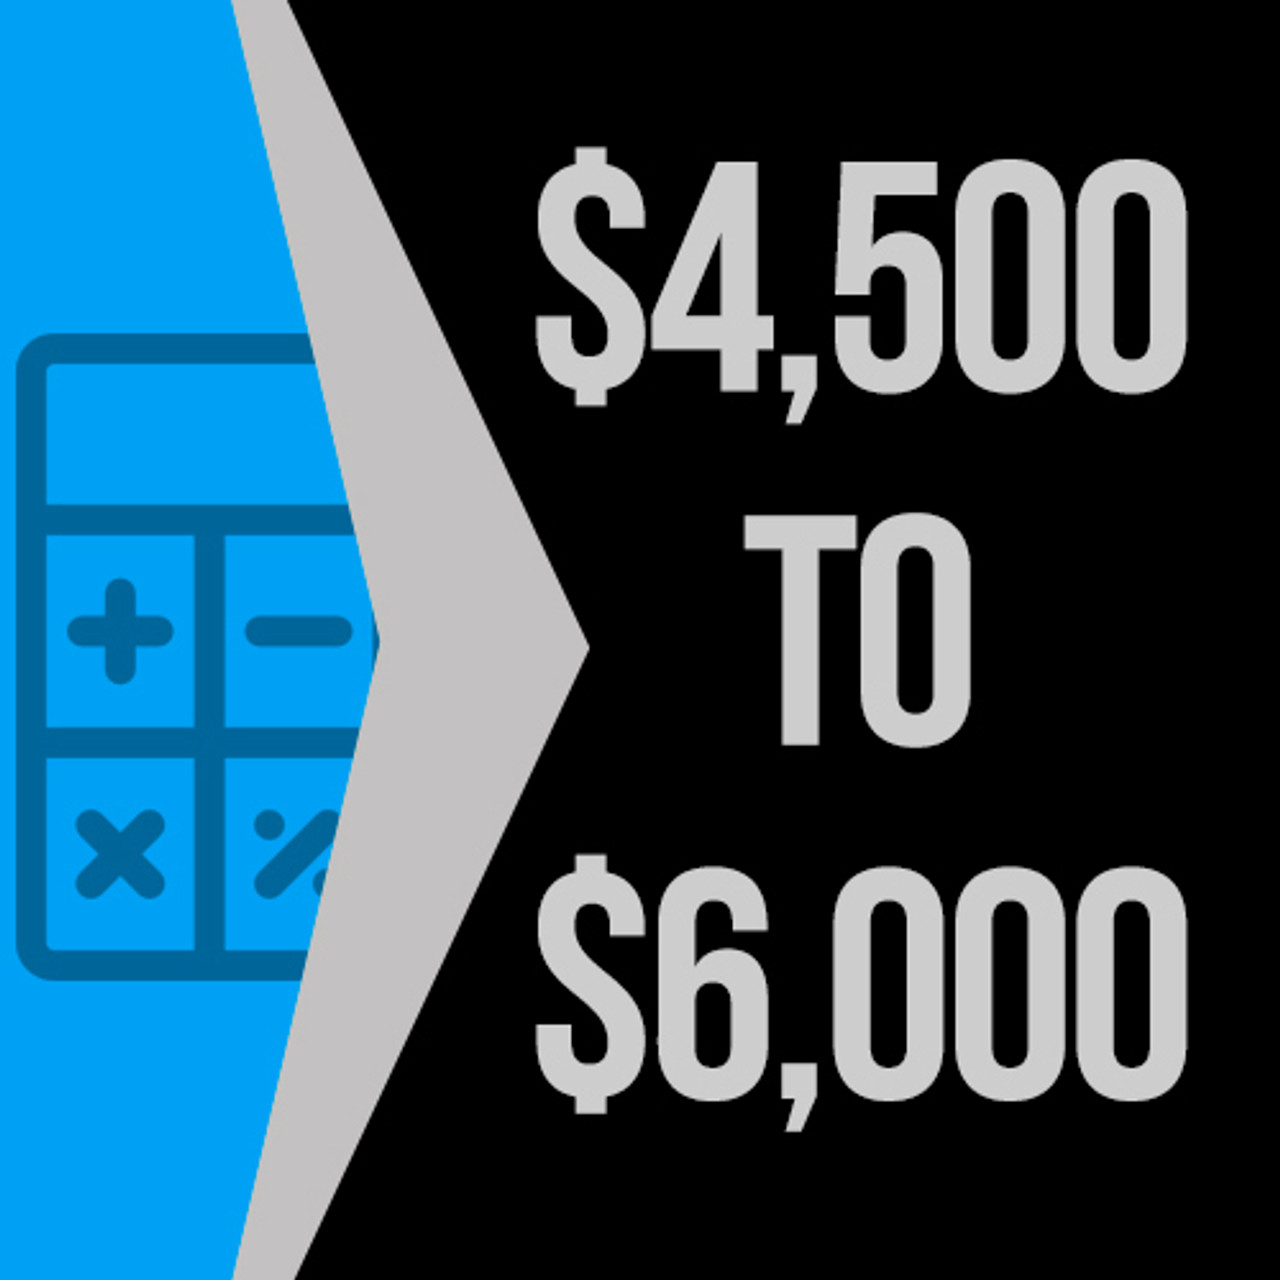 $4500 to $6000